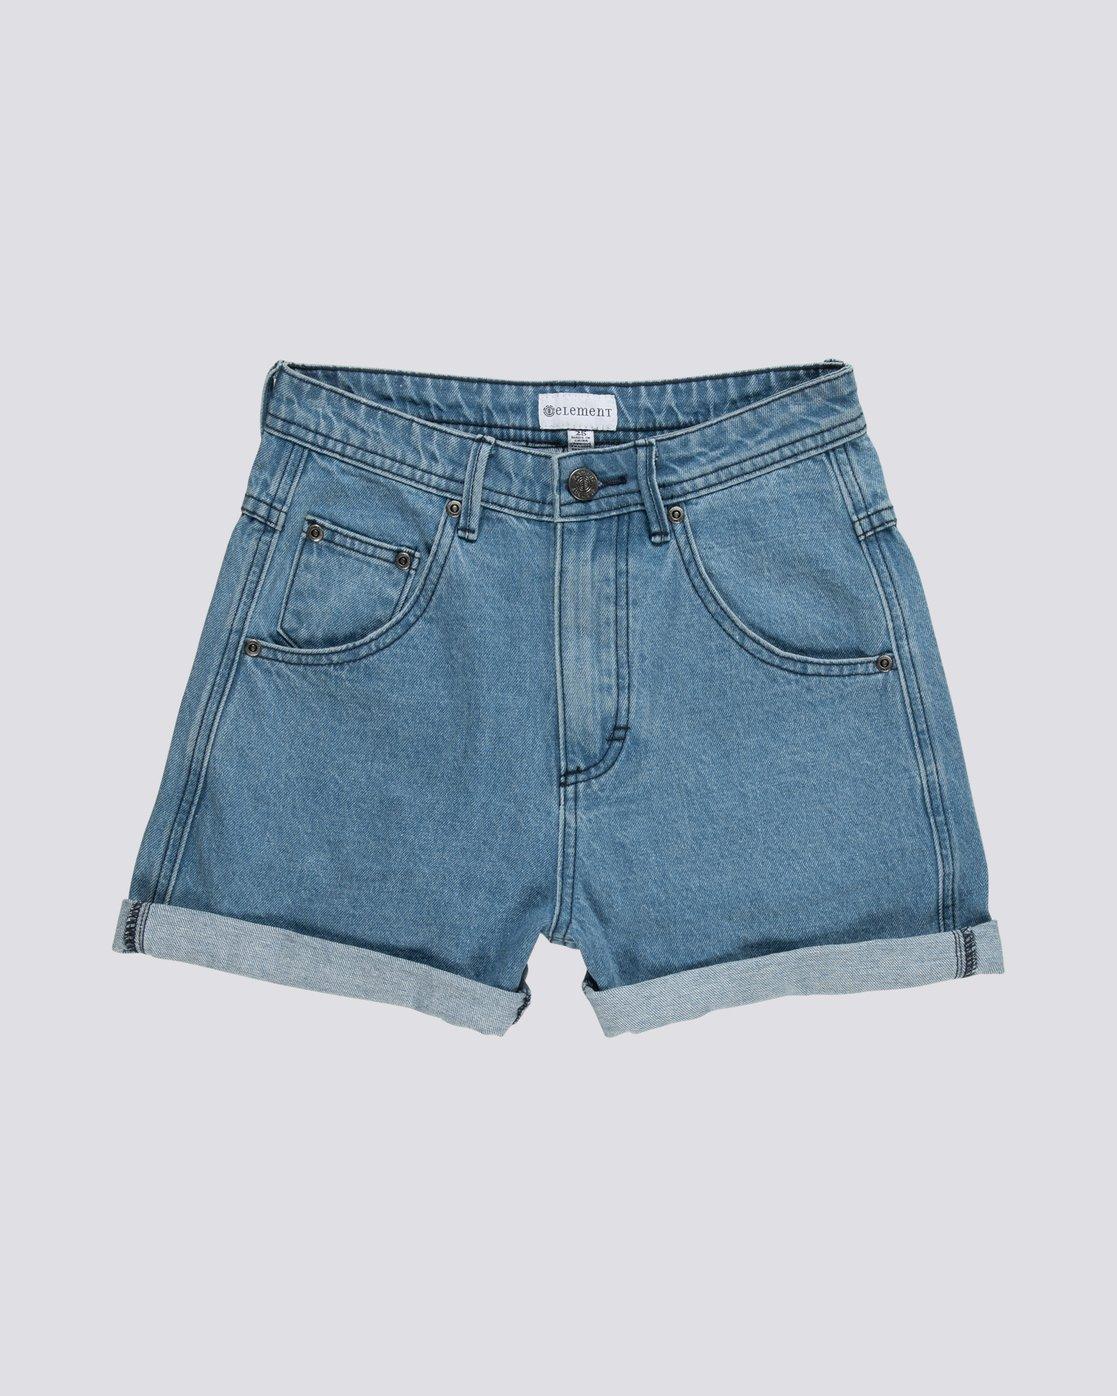 Roxanne Pantalones Cortos De Tiro Alto Para Mujer S3wka4elp0 Element